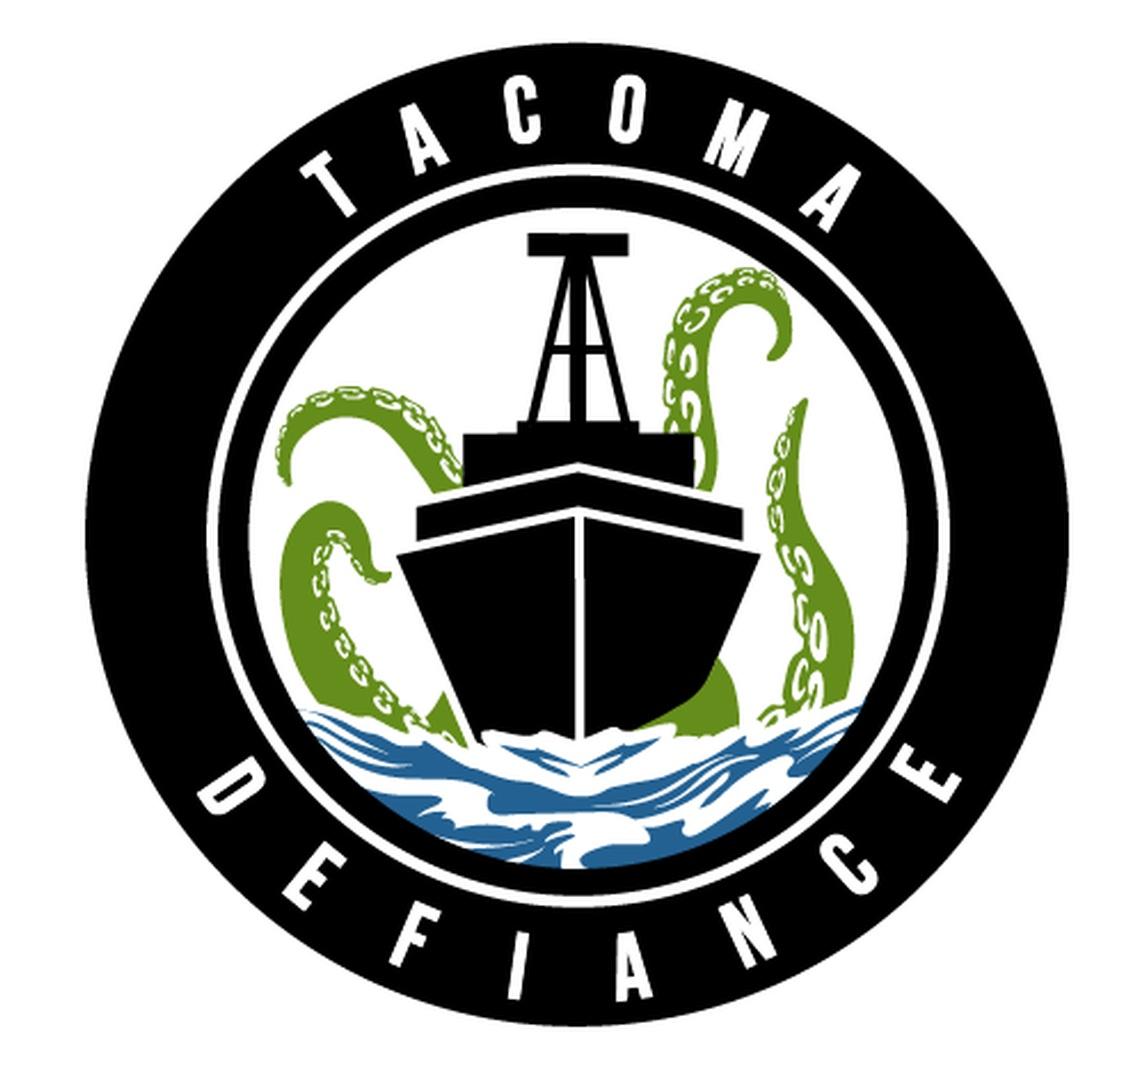 Tacoma Defiance.jpg